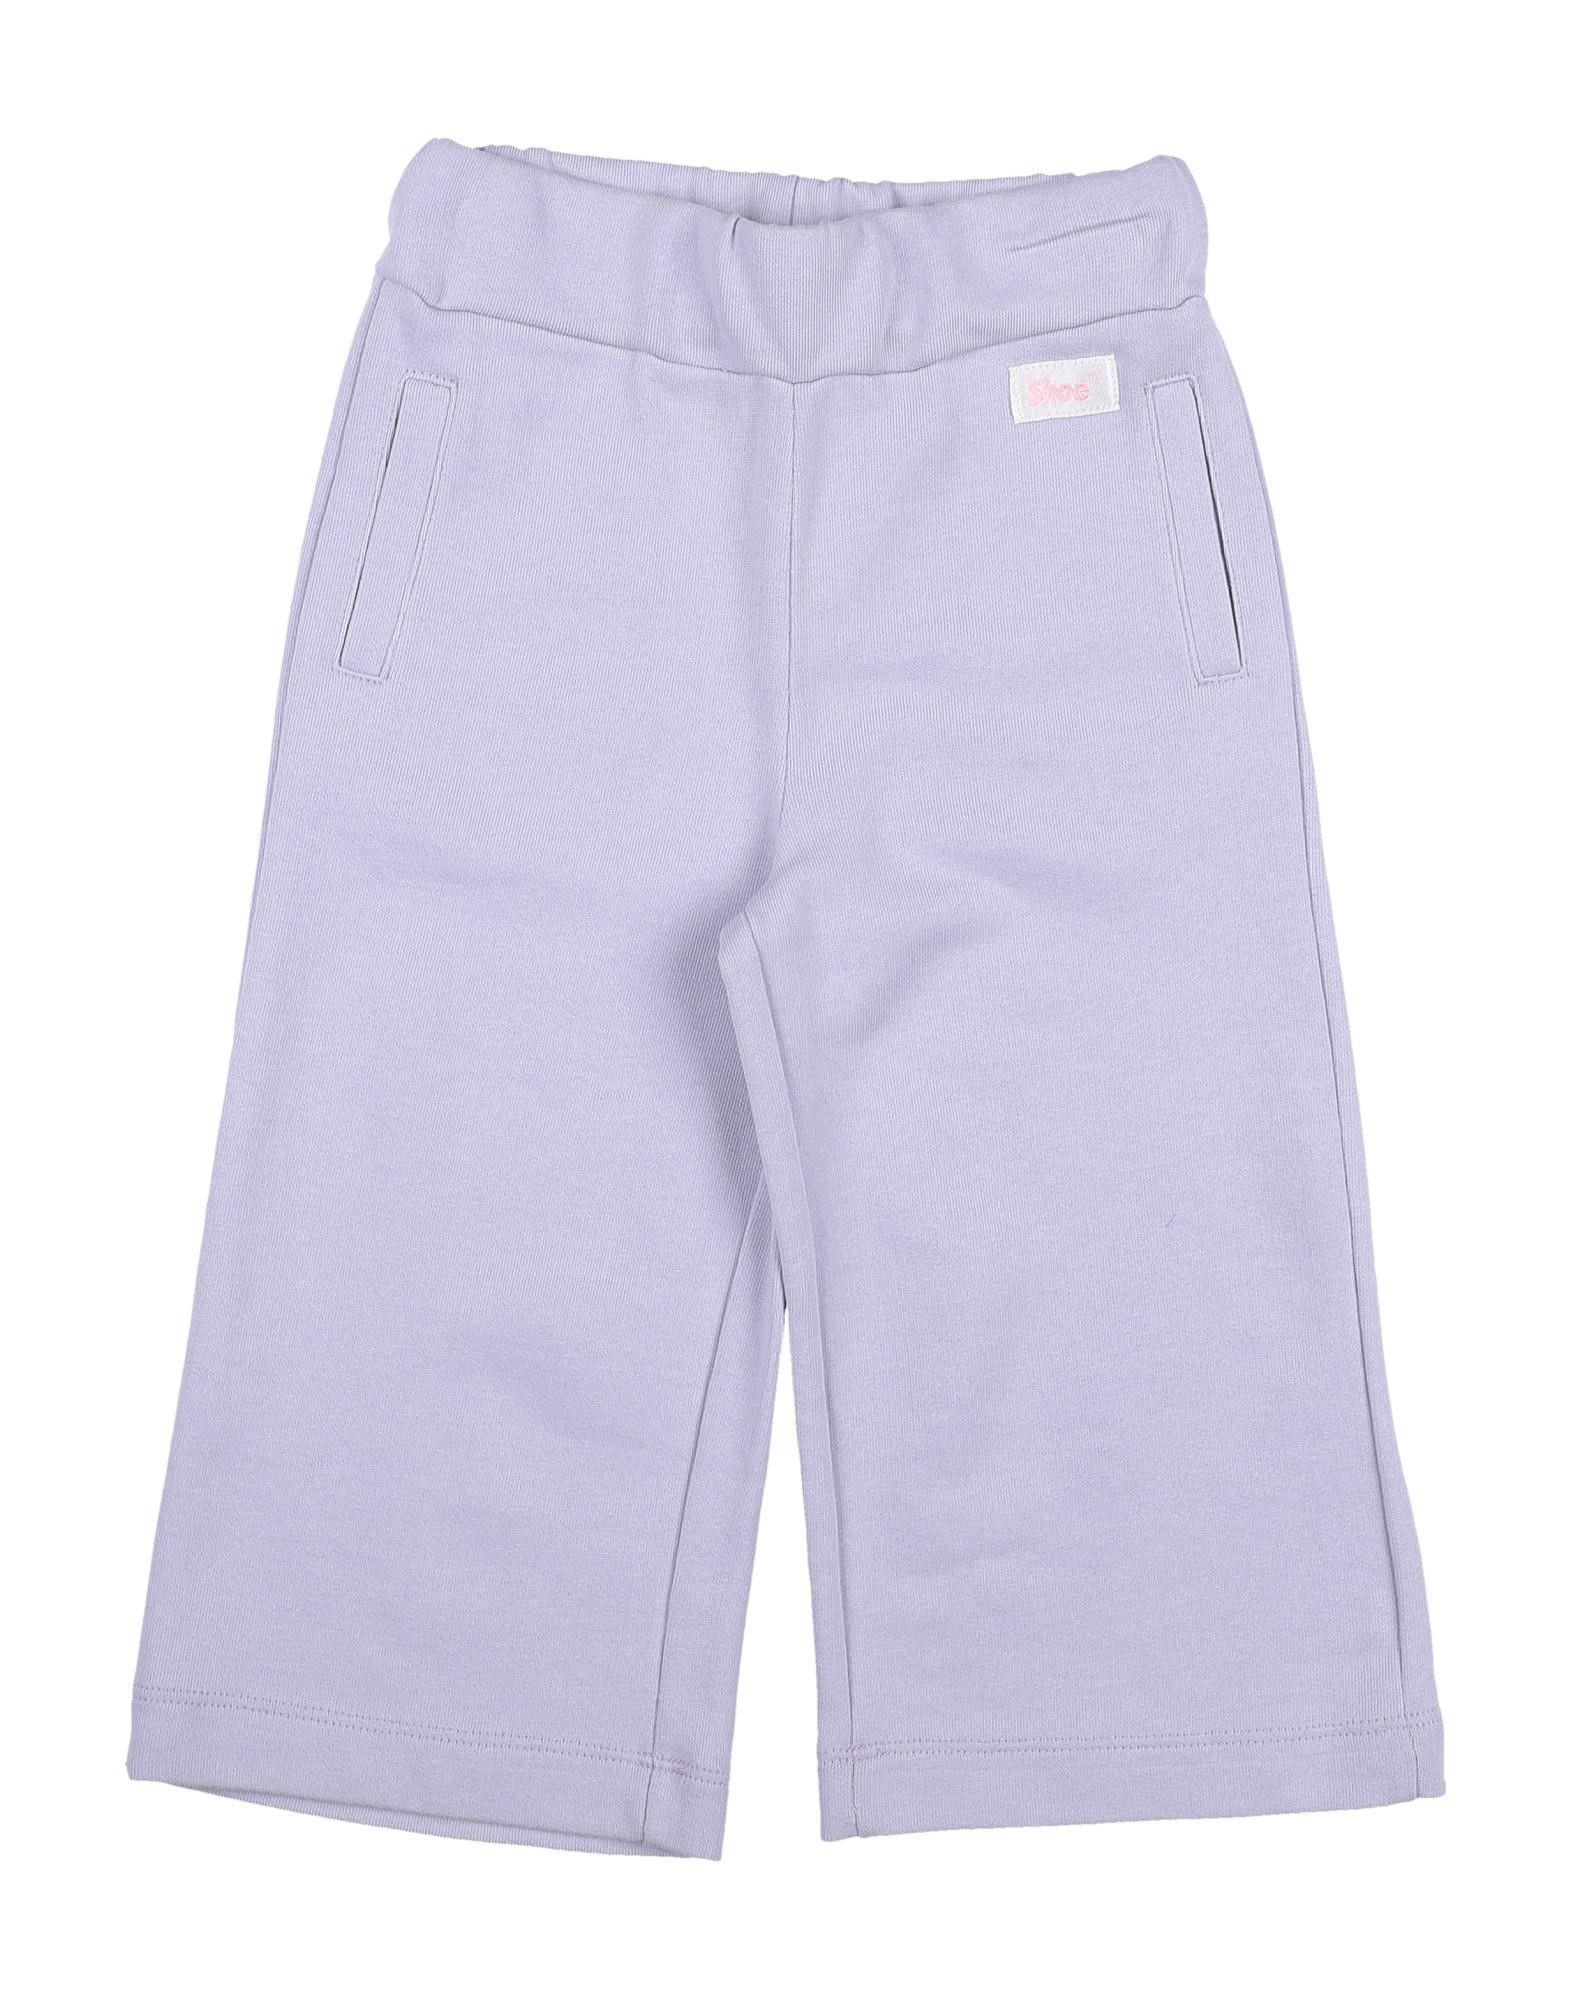 Shoeshine Kids' Casual Pants In Lilac